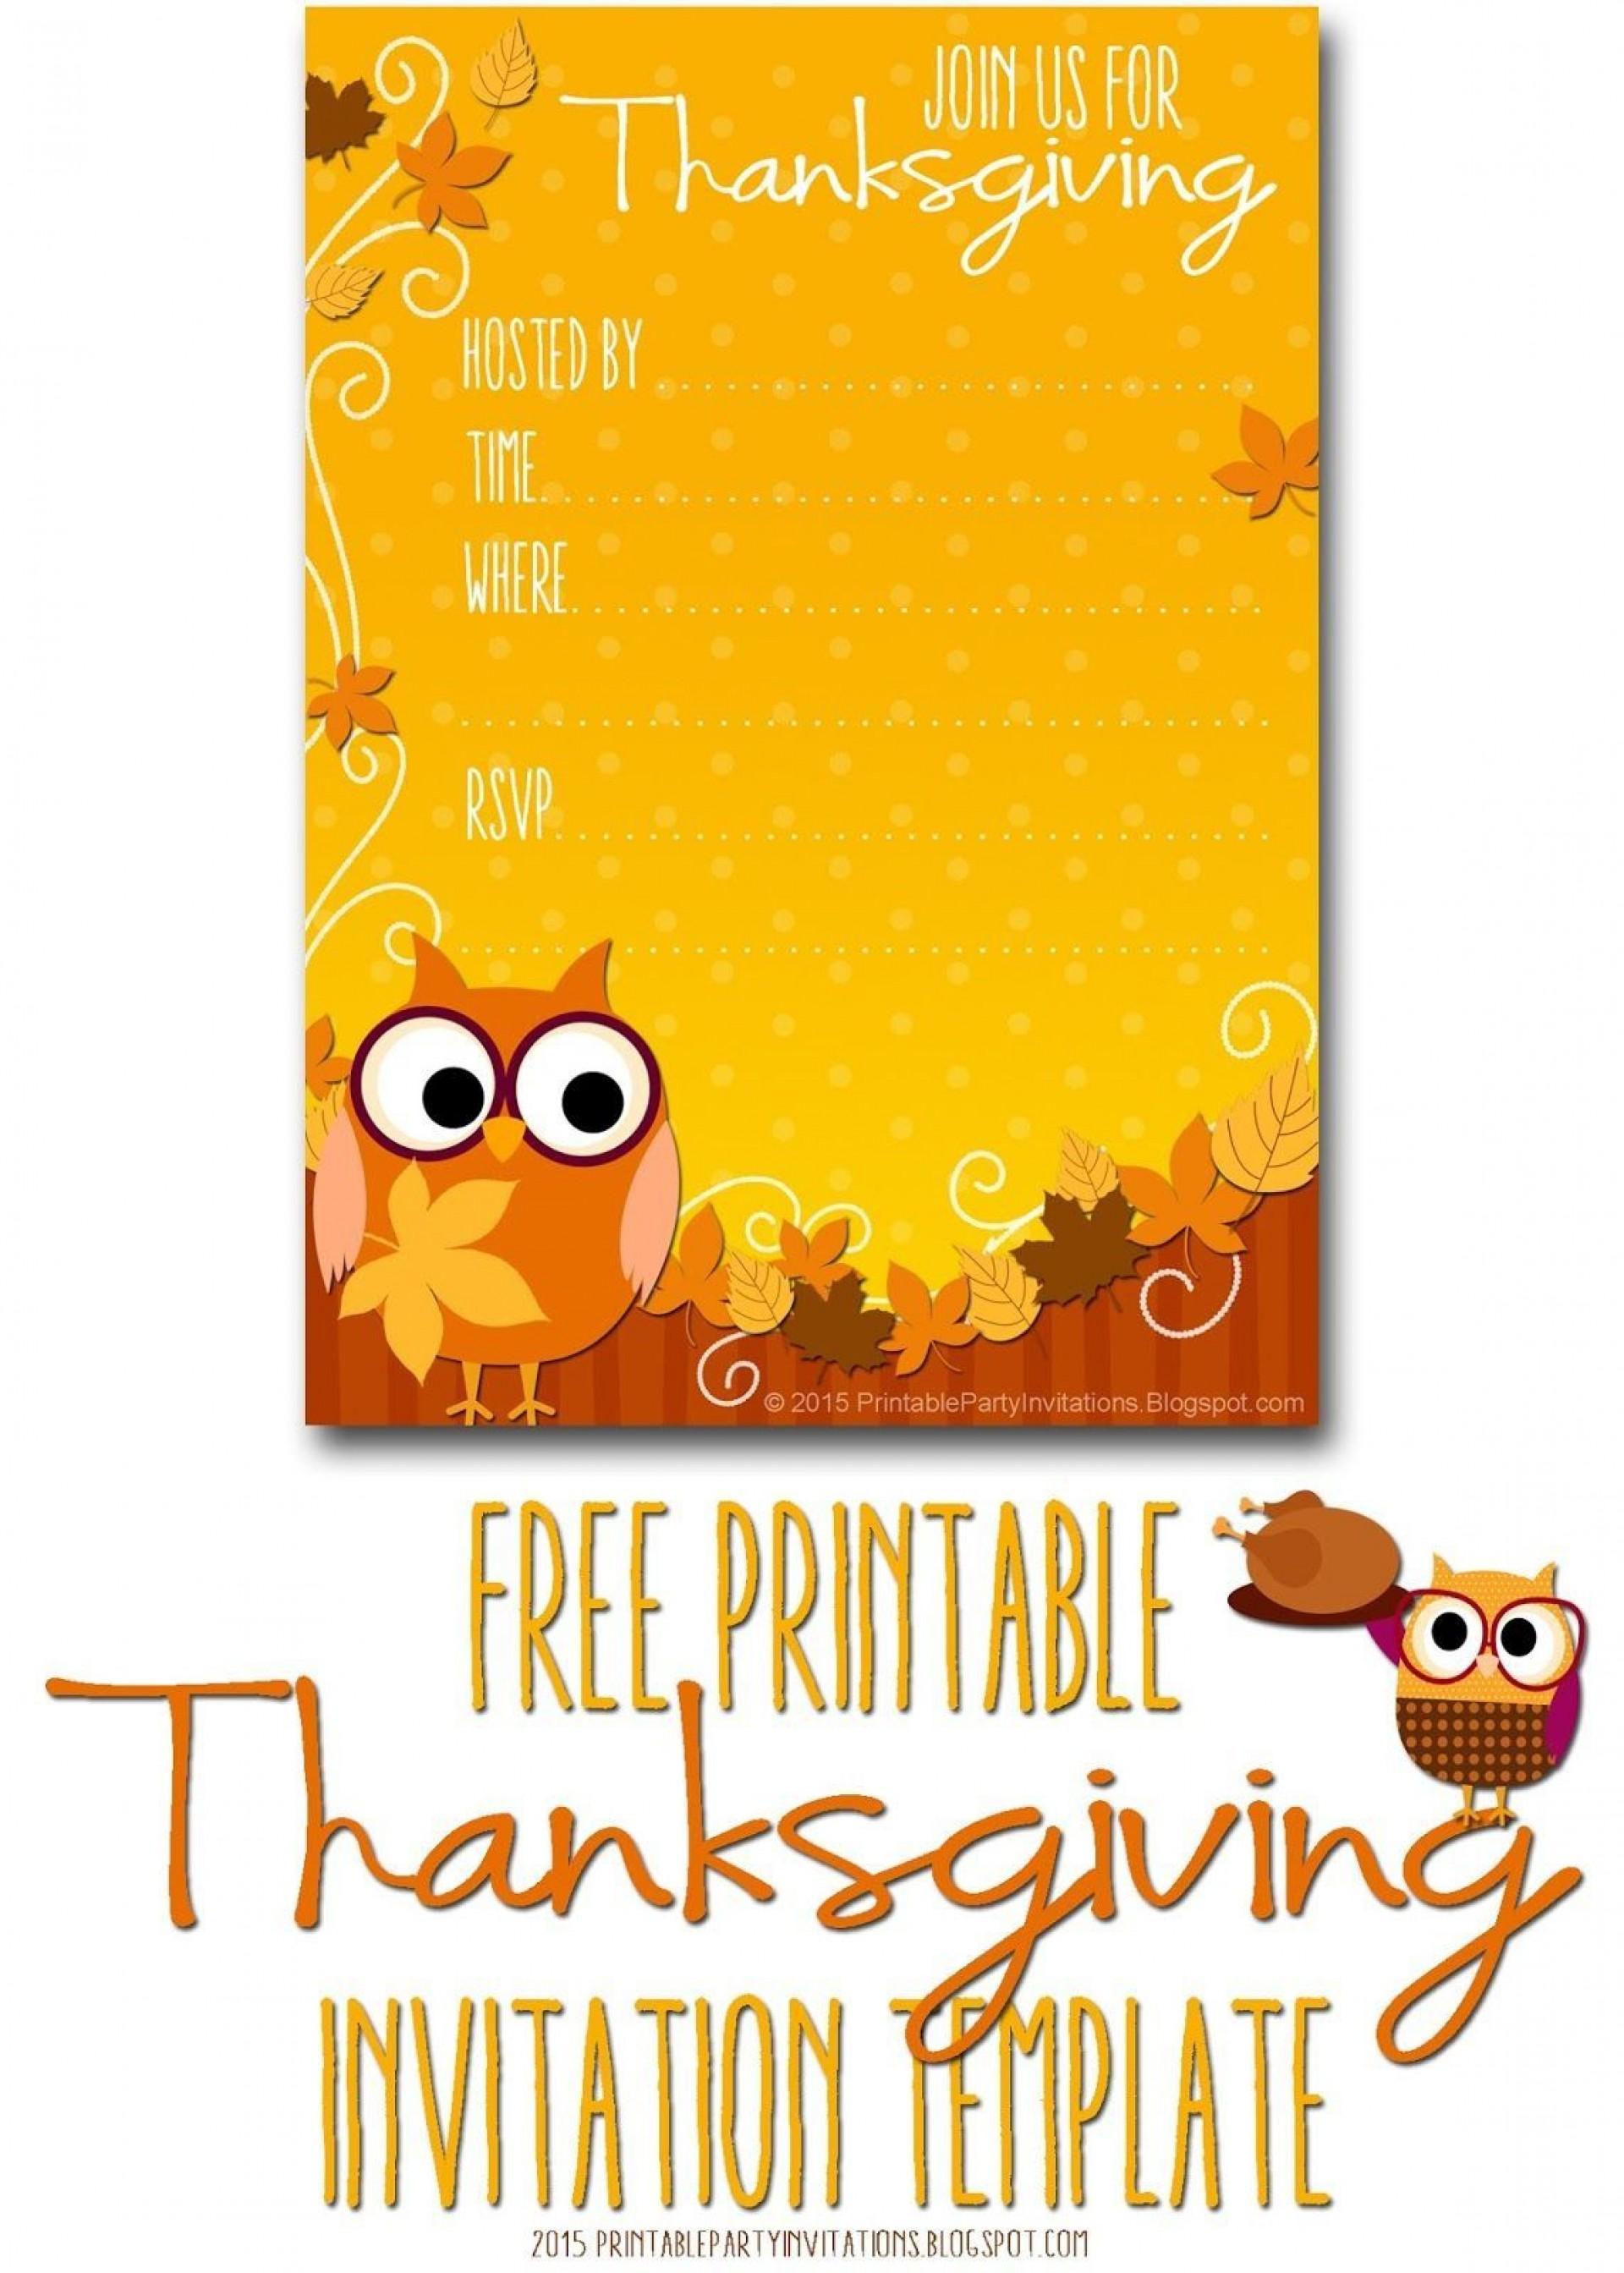 004 Singular Free Thanksgiving Invitation Template Design  Templates Printable Dinner Download Potluck1920